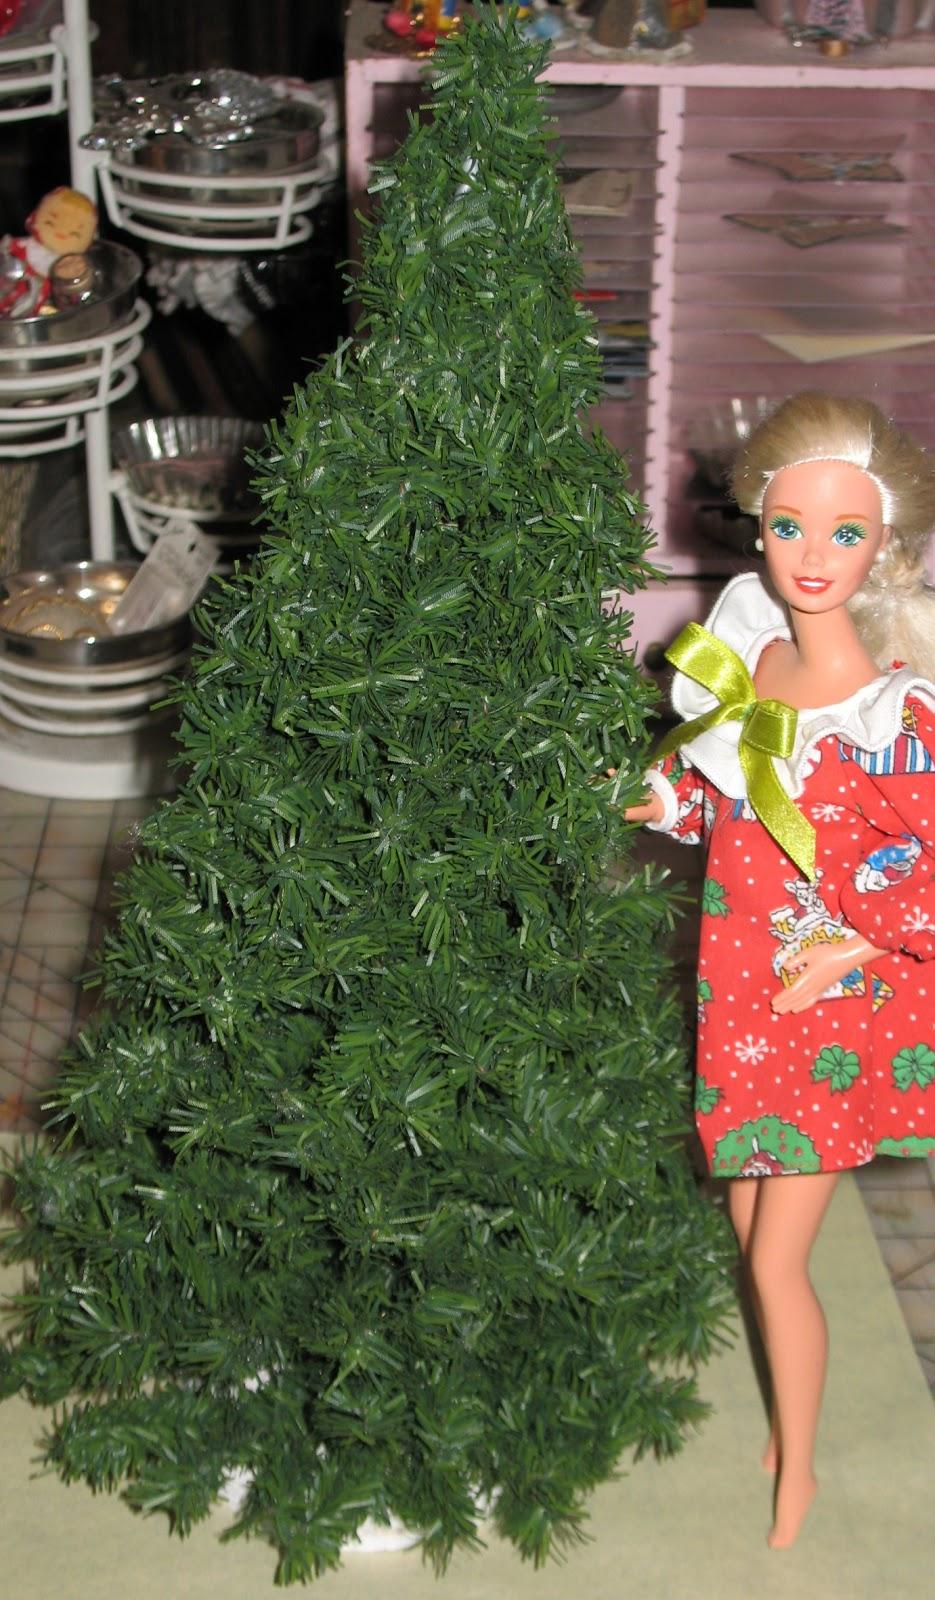 Artsy Fartsy: Ohhhhh Christmas Tree....